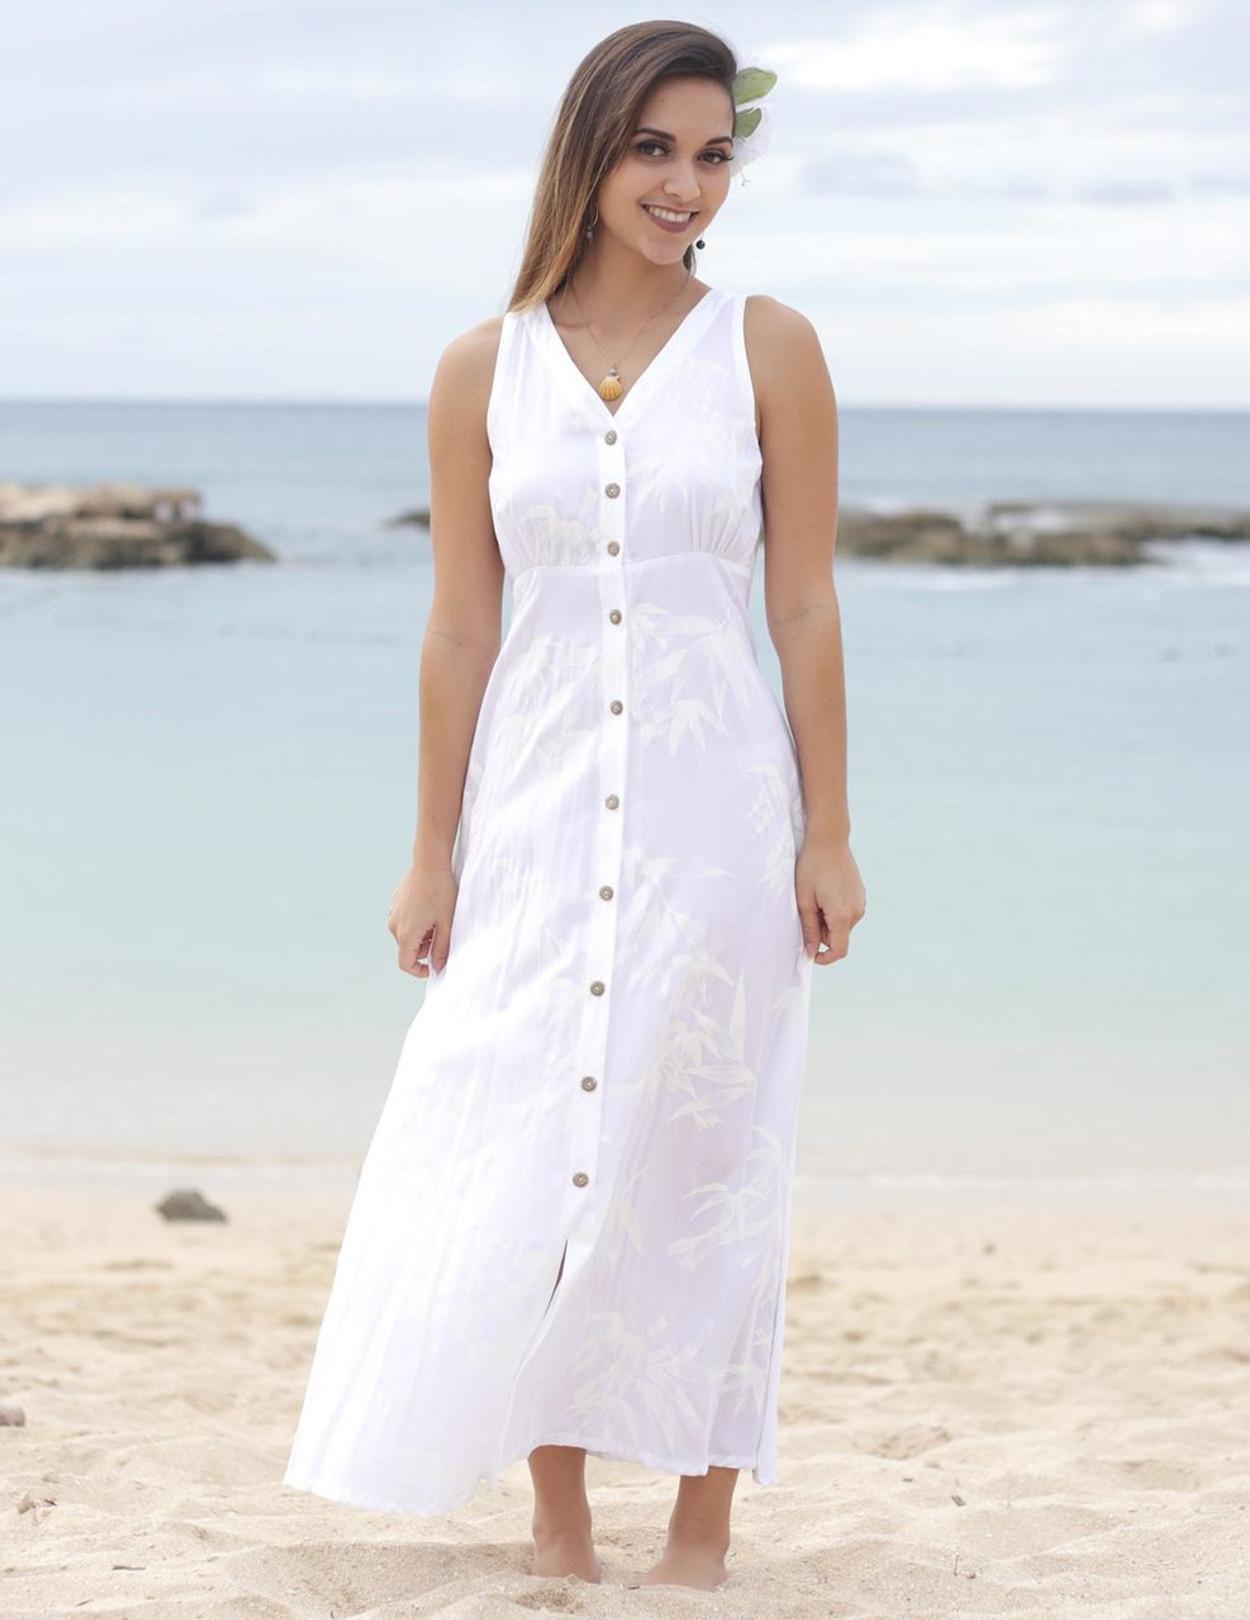 Maxi White Wedding Dress Bamboo Design - Hawaiian Wedding Place